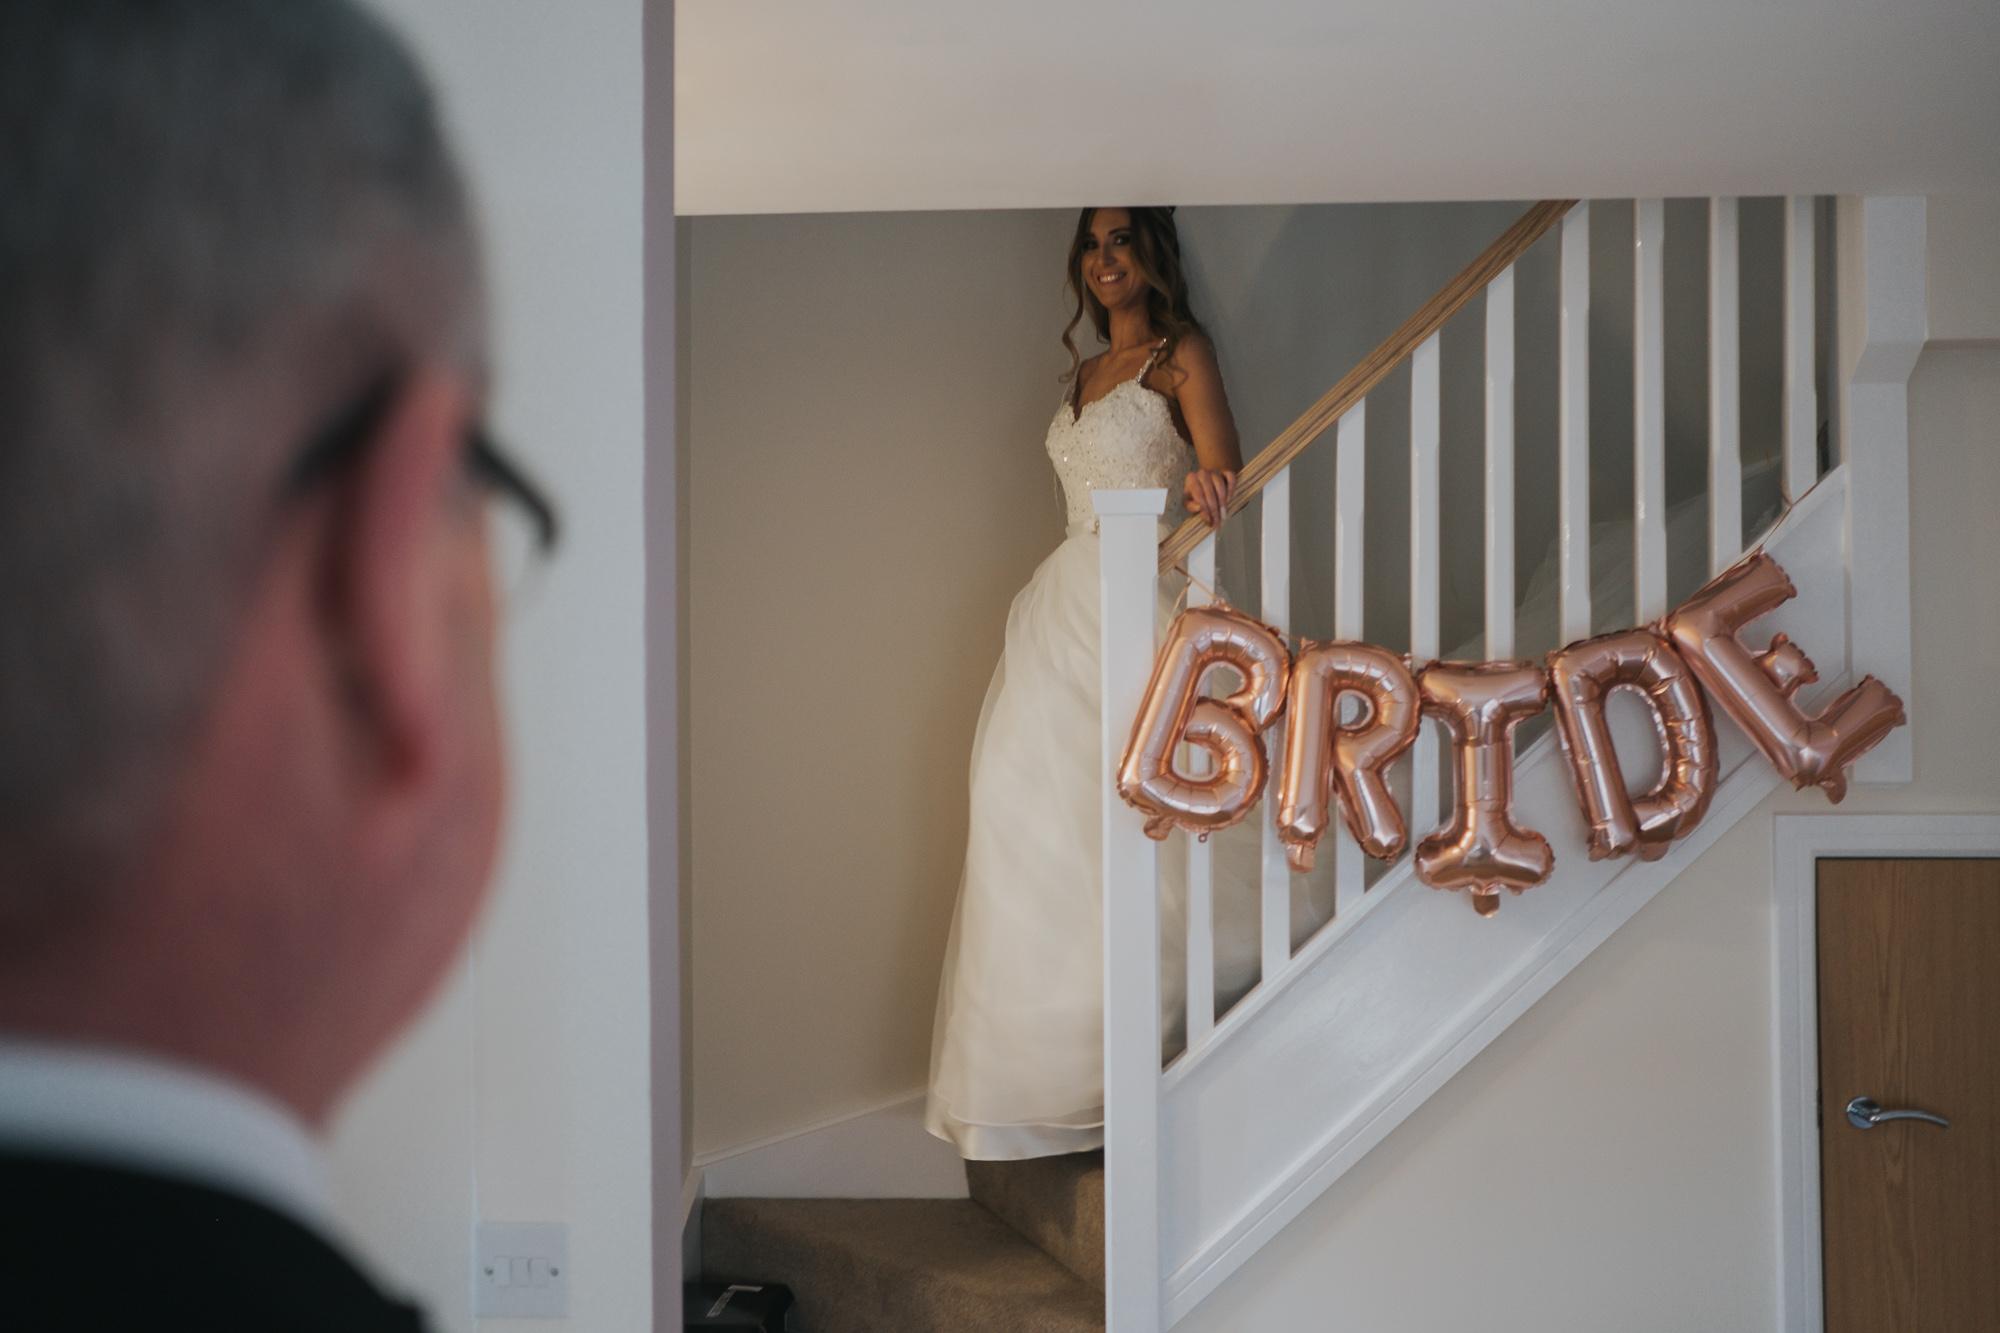 West Tower Exclusive Wedding Venue wedding photography merseyside and lancashire wedding photographer (12 of 60).jpg